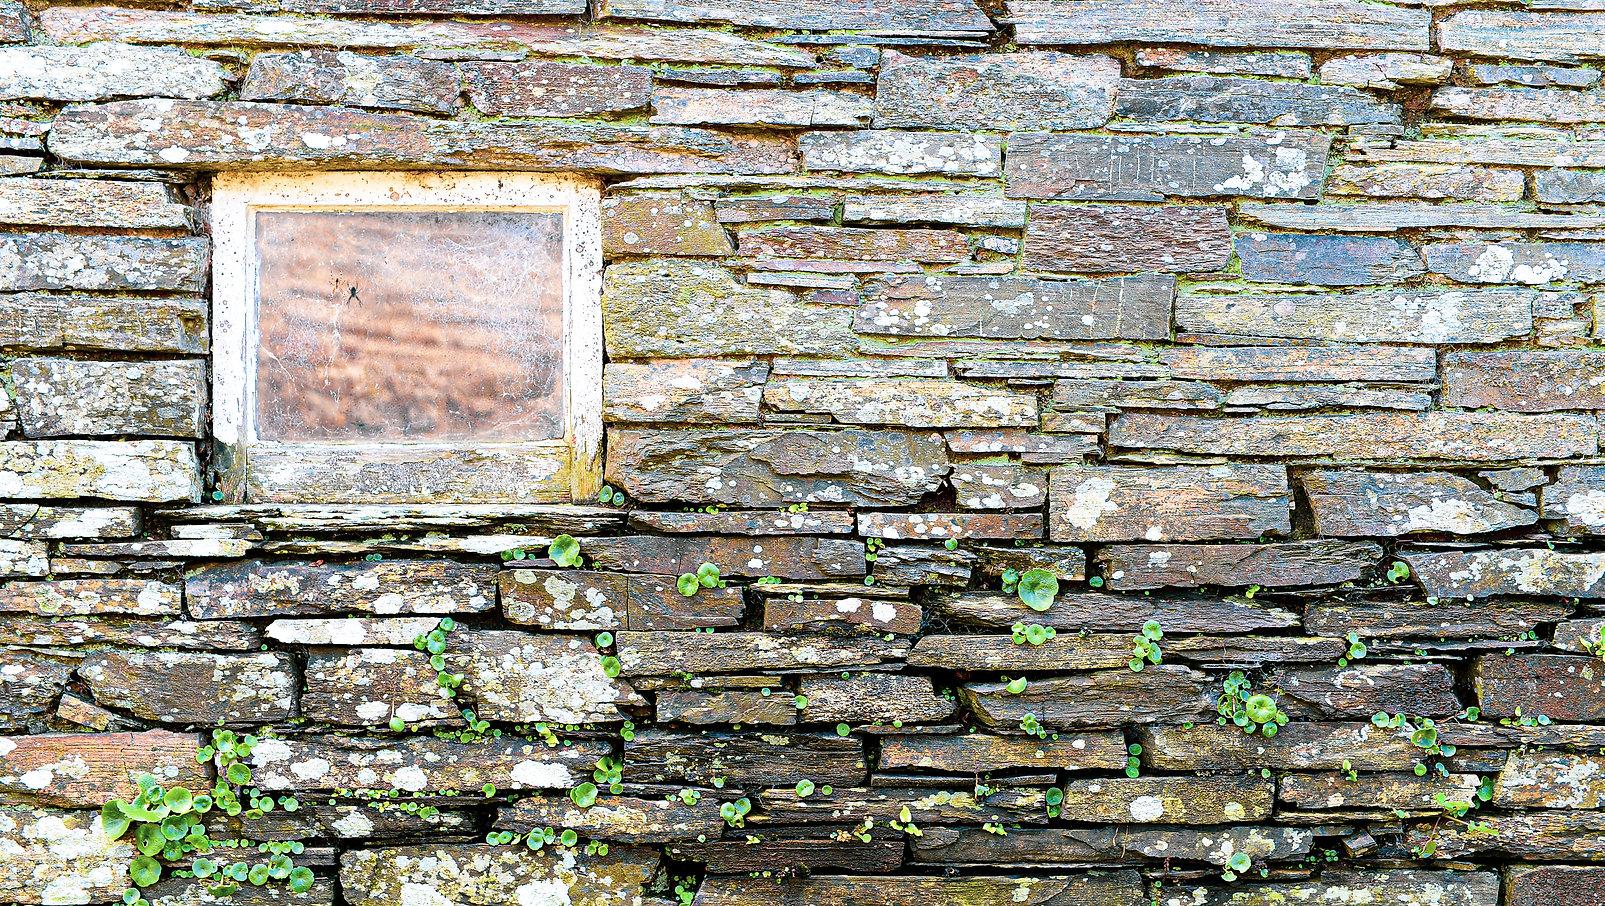 Hausmauer, St. Nectars Glenn, Cornwall ©Johannes Ratermann